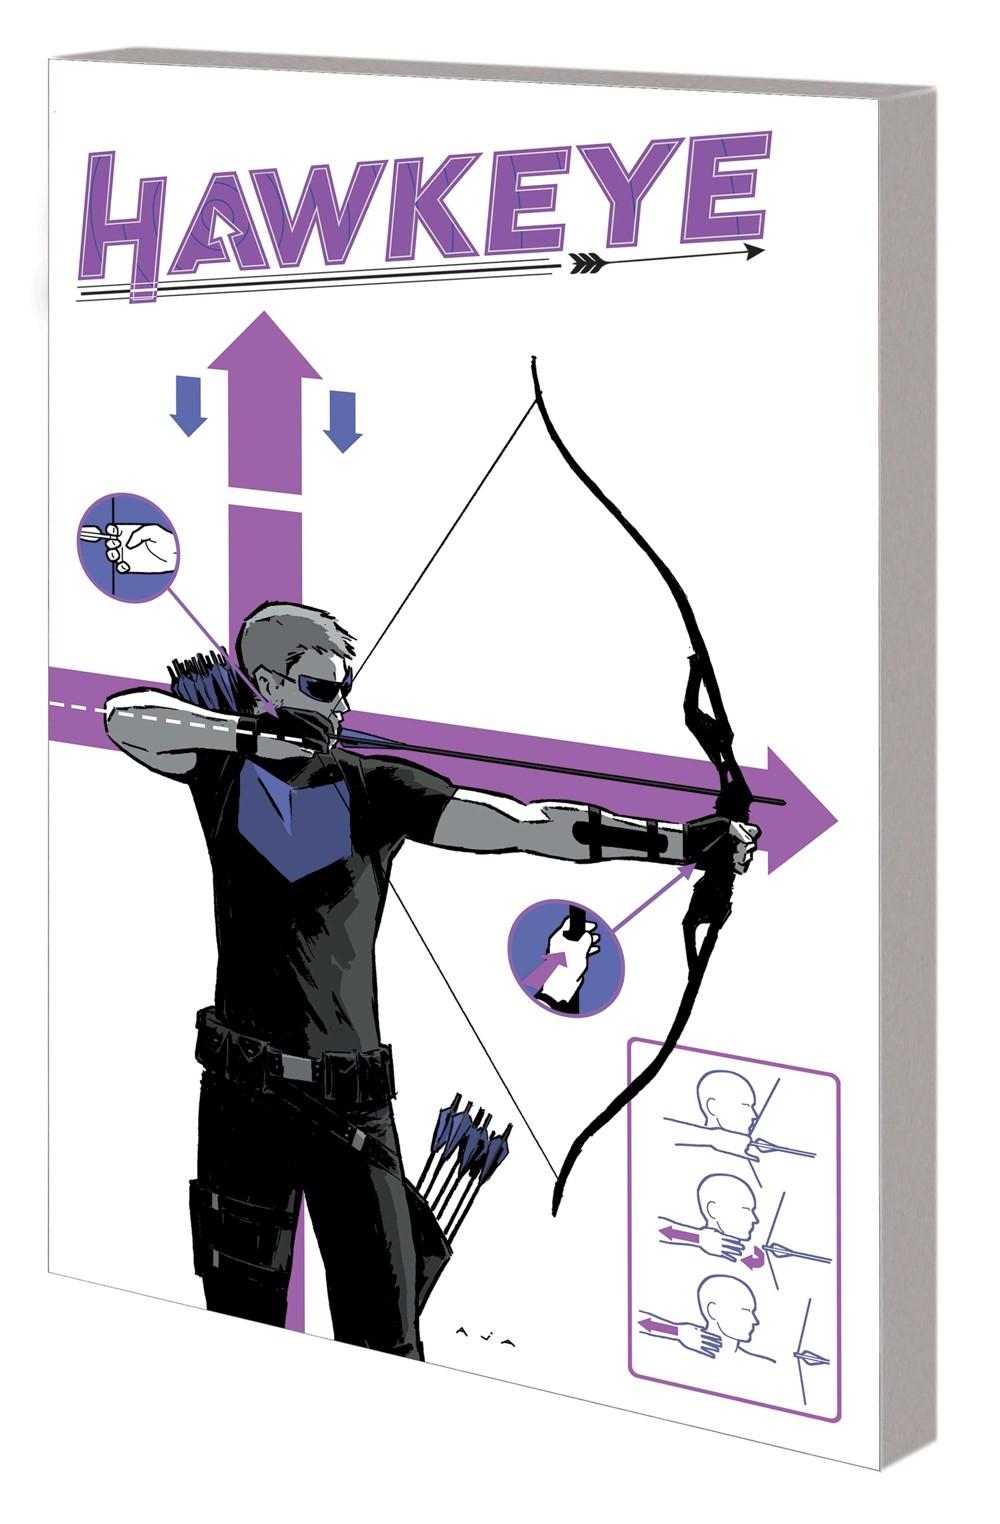 HAWKEYE_SAGA_TPB_AJA Marvel Comics September 2021 Solicitations